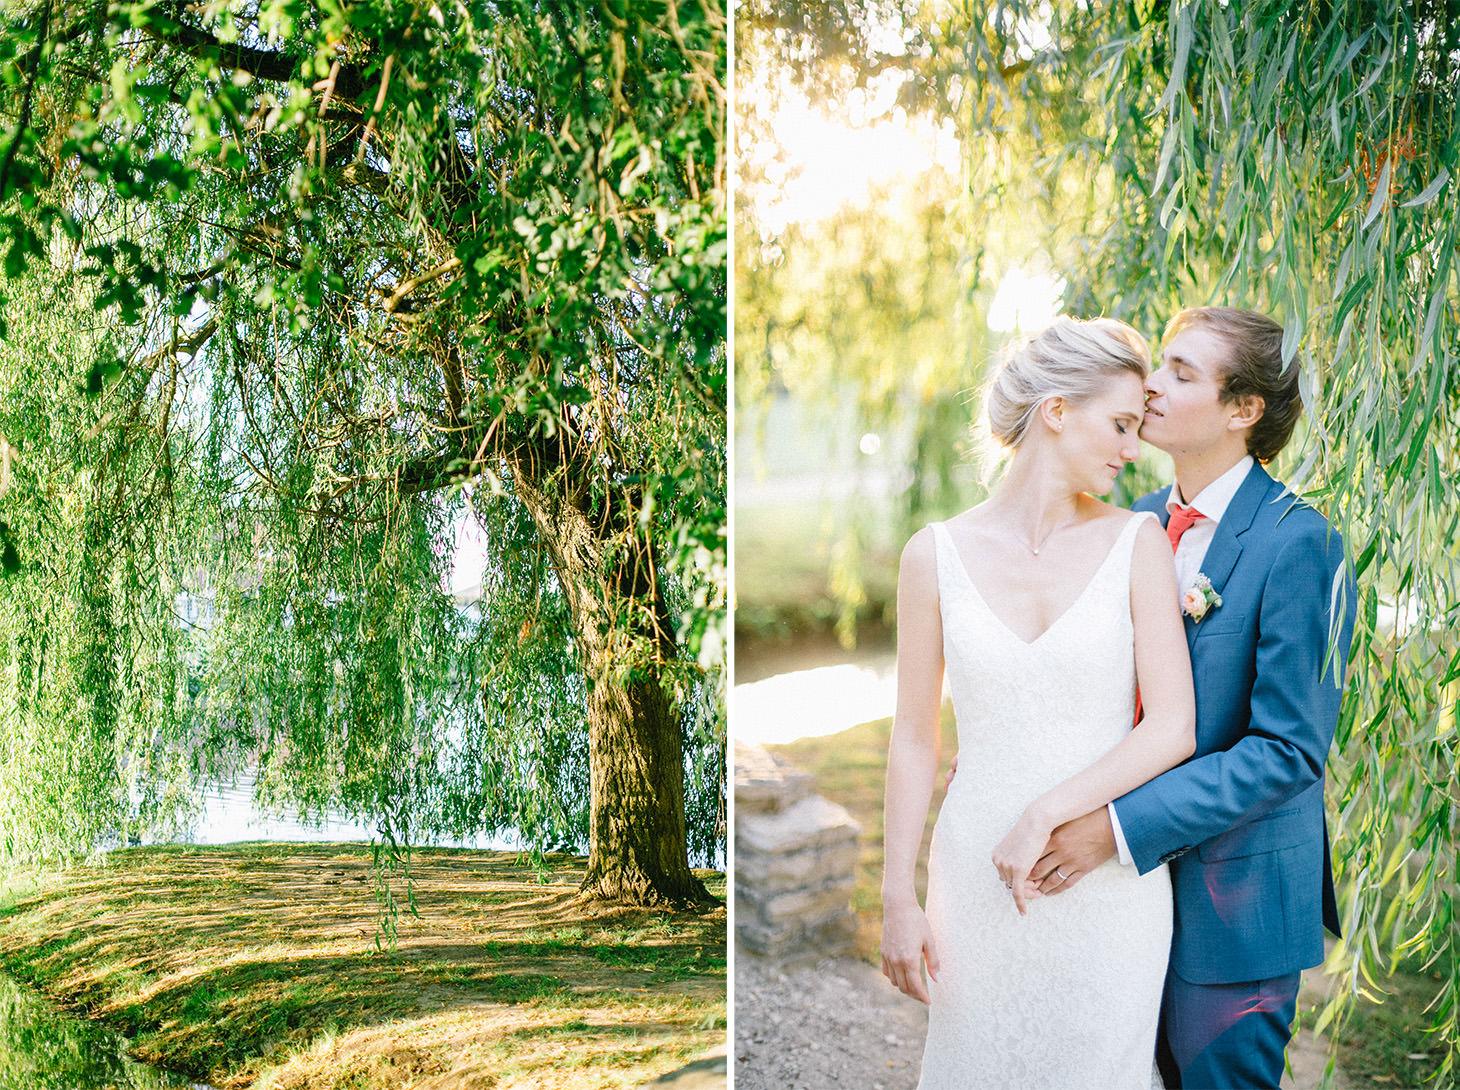 photographe-mariage-paris-montfort-l-amaury-077